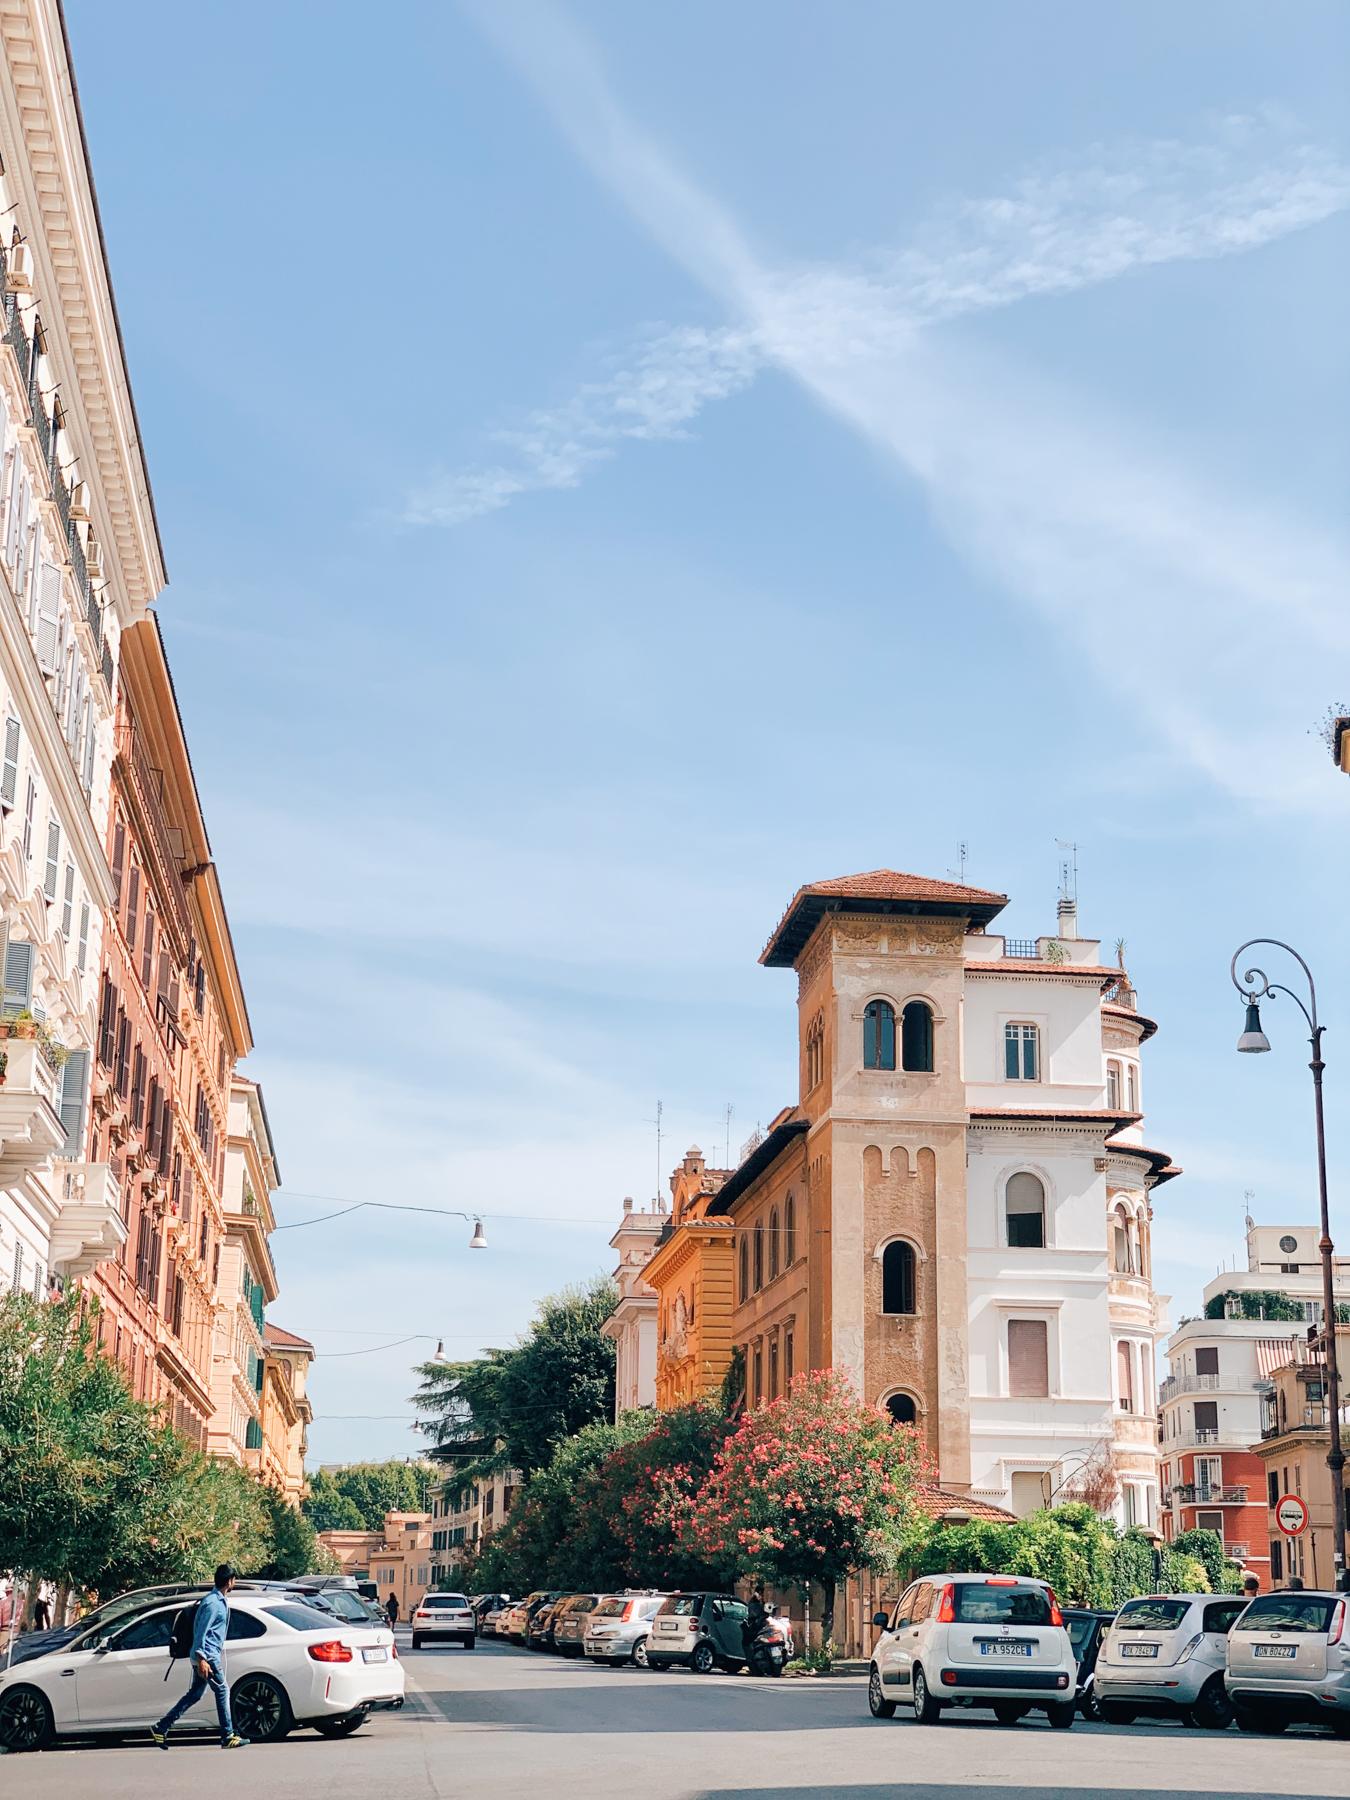 All the Roman neighborhoods were so sweet!